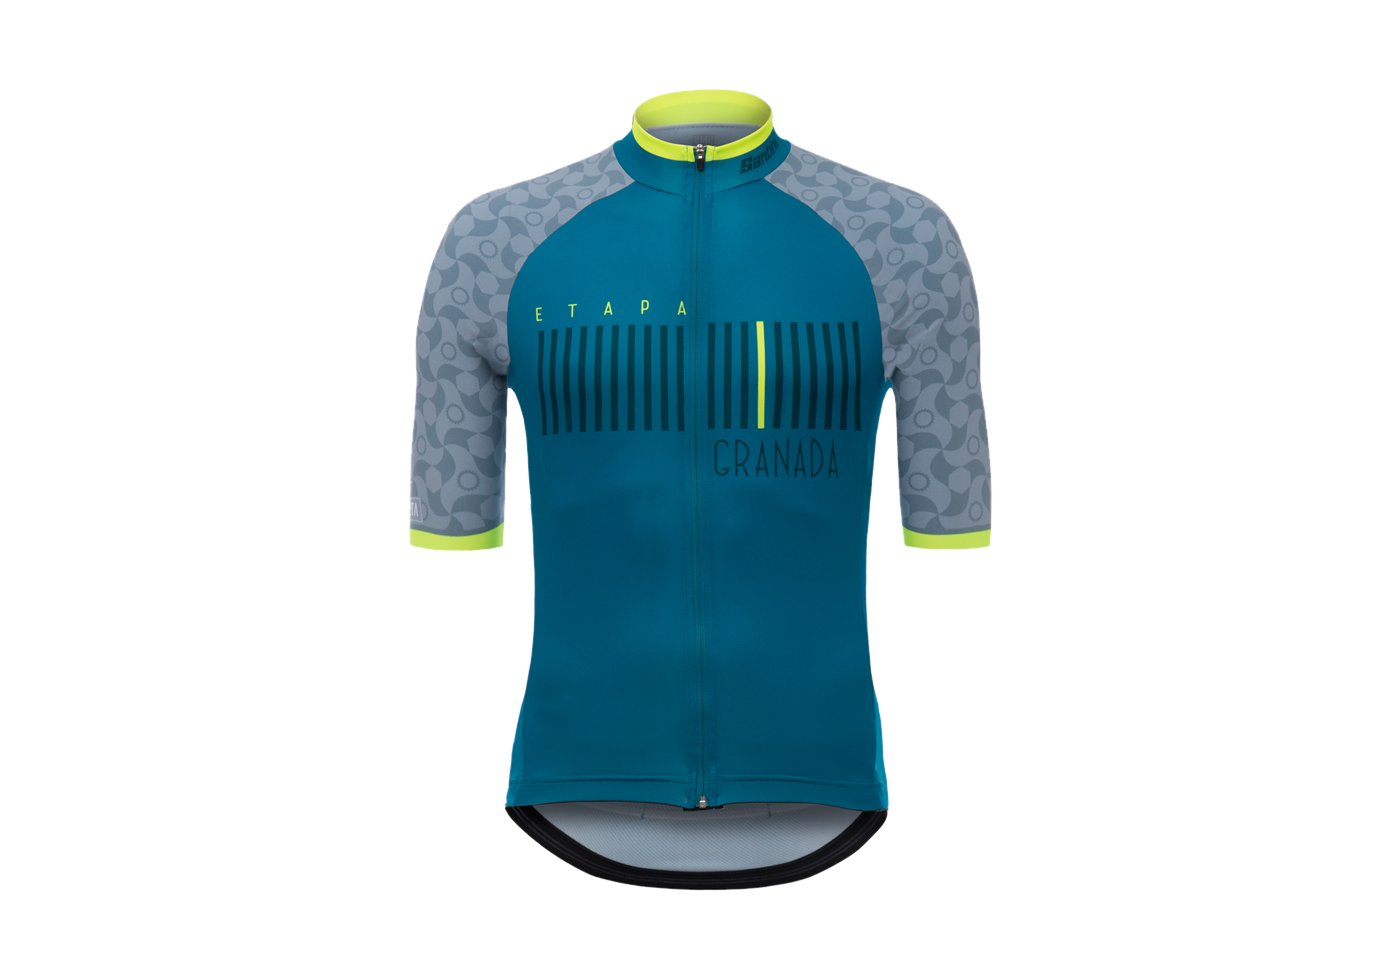 Maillot La Vuelta Granada 2017